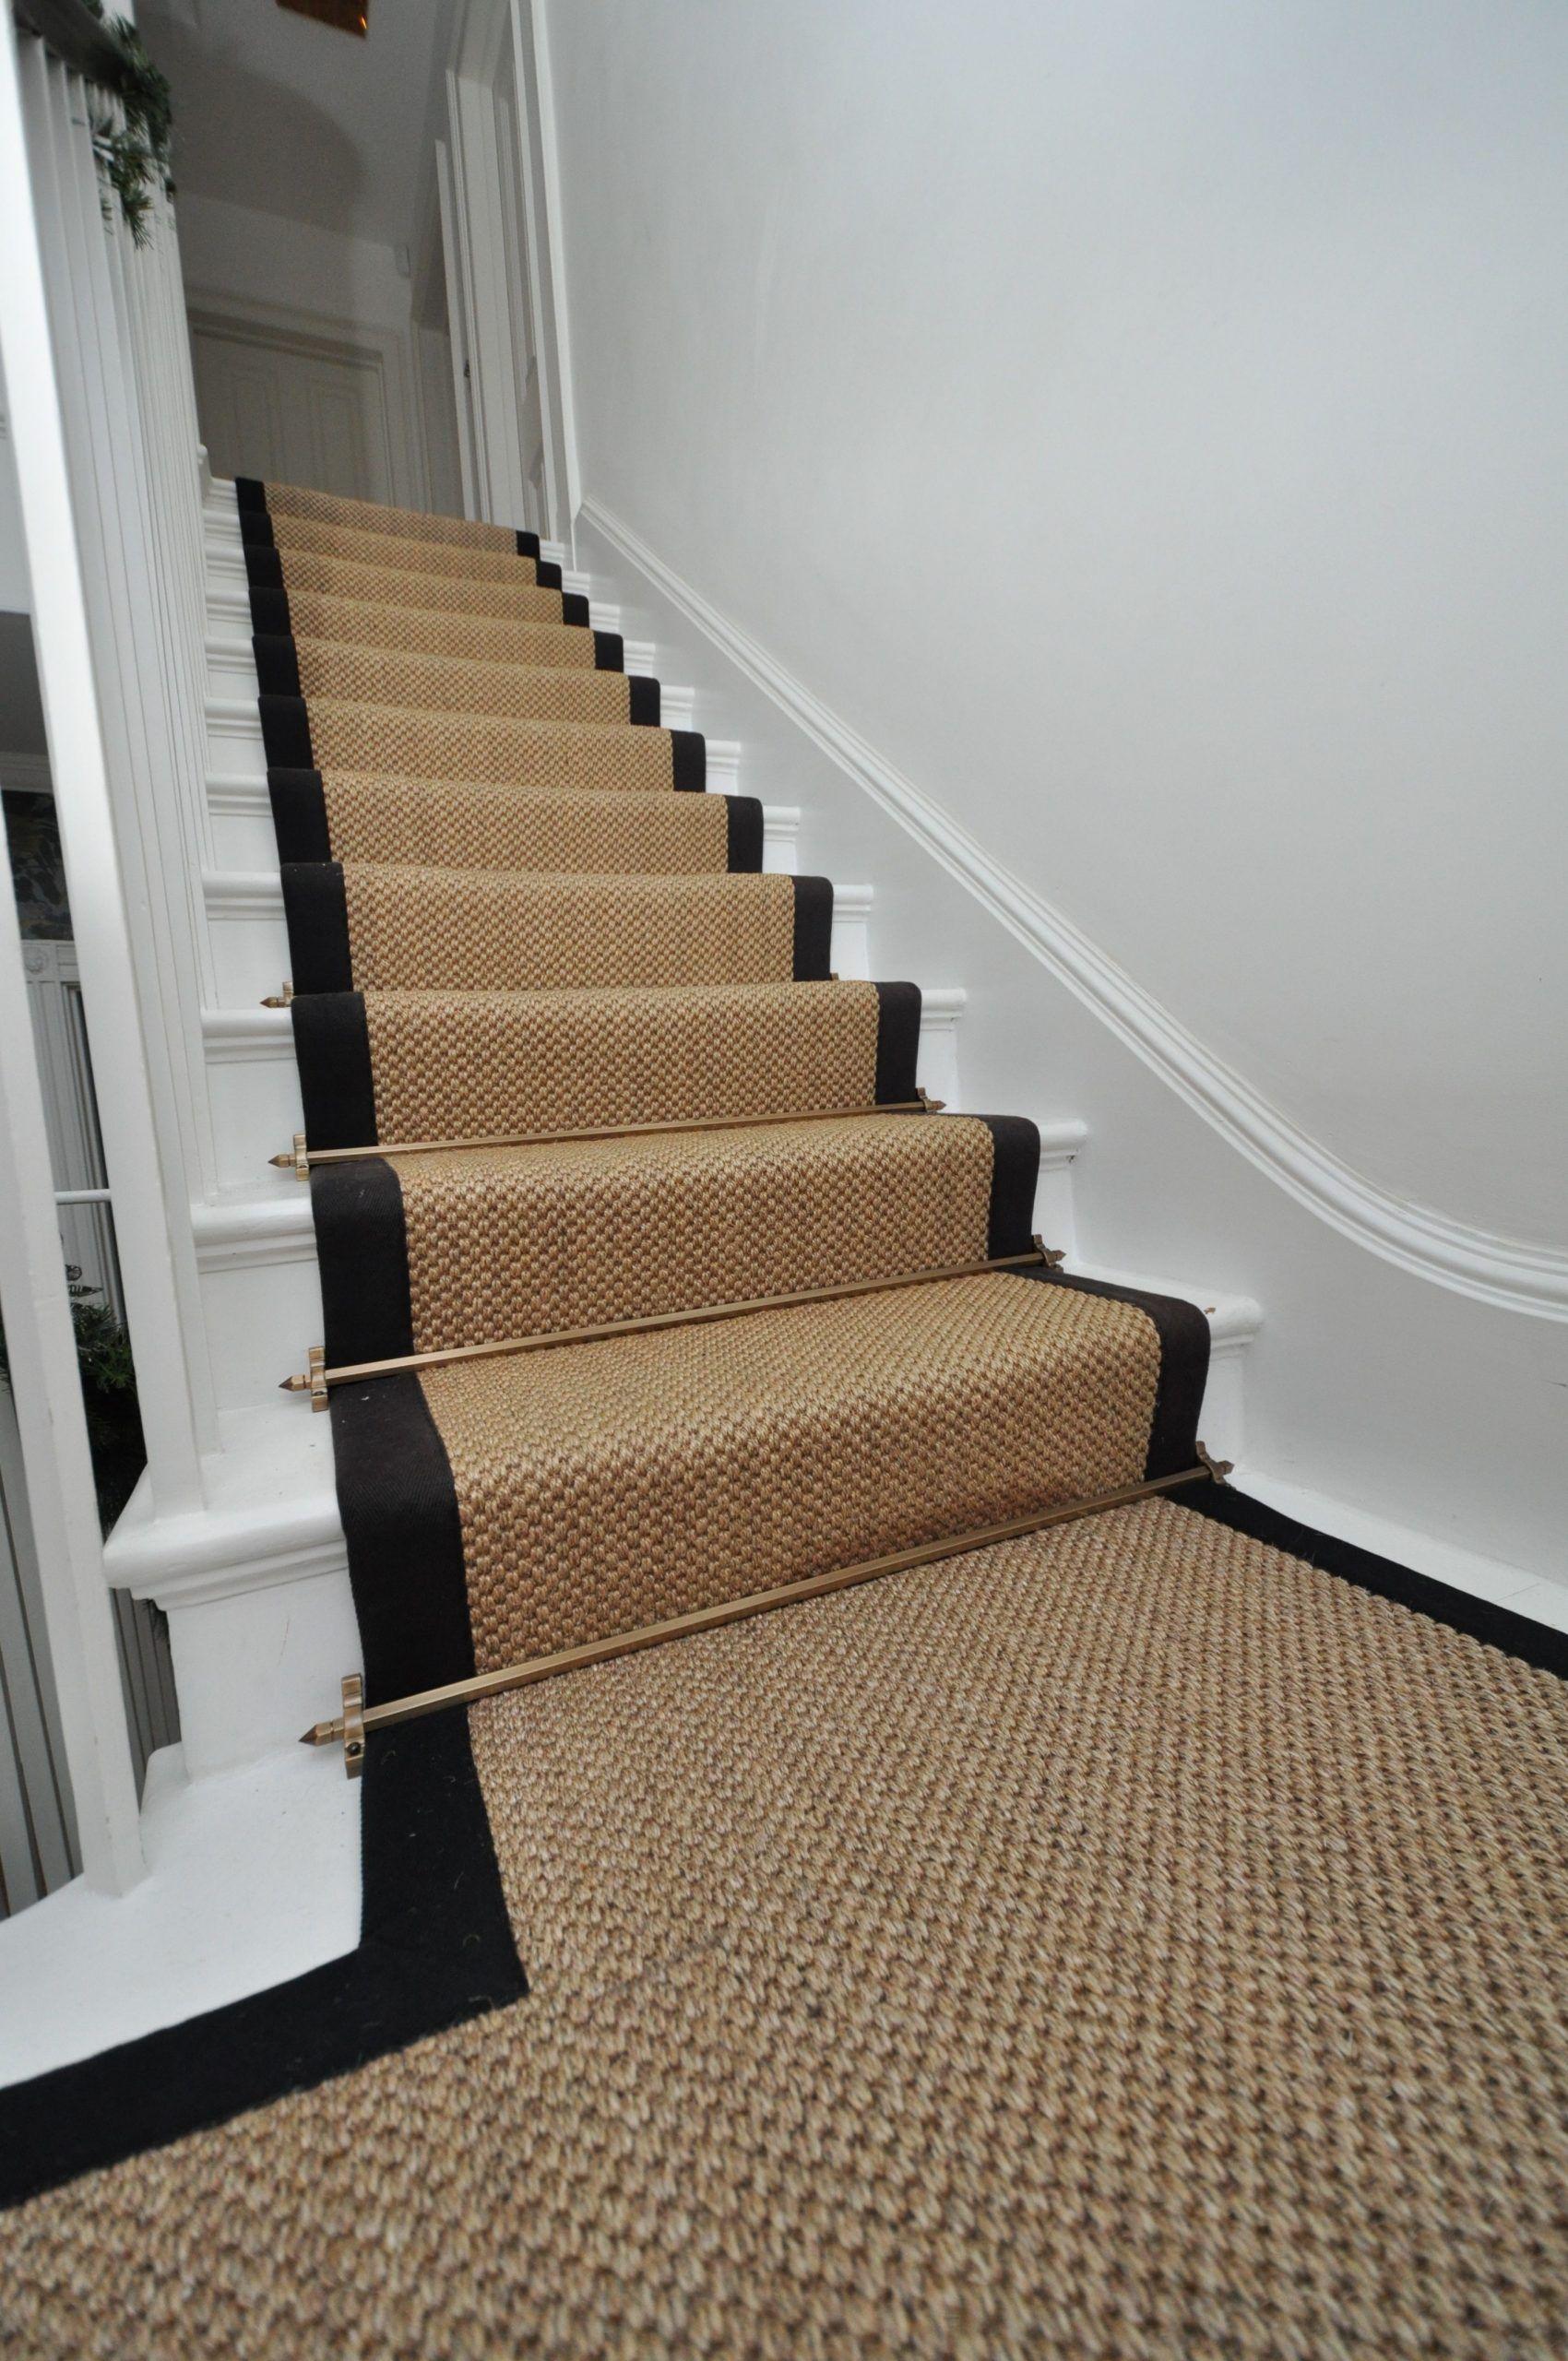 Pin By Angela Barnes On Tiny Spaces In 2020 Sisal Stair Runner Stair Runner Carpet Stairs